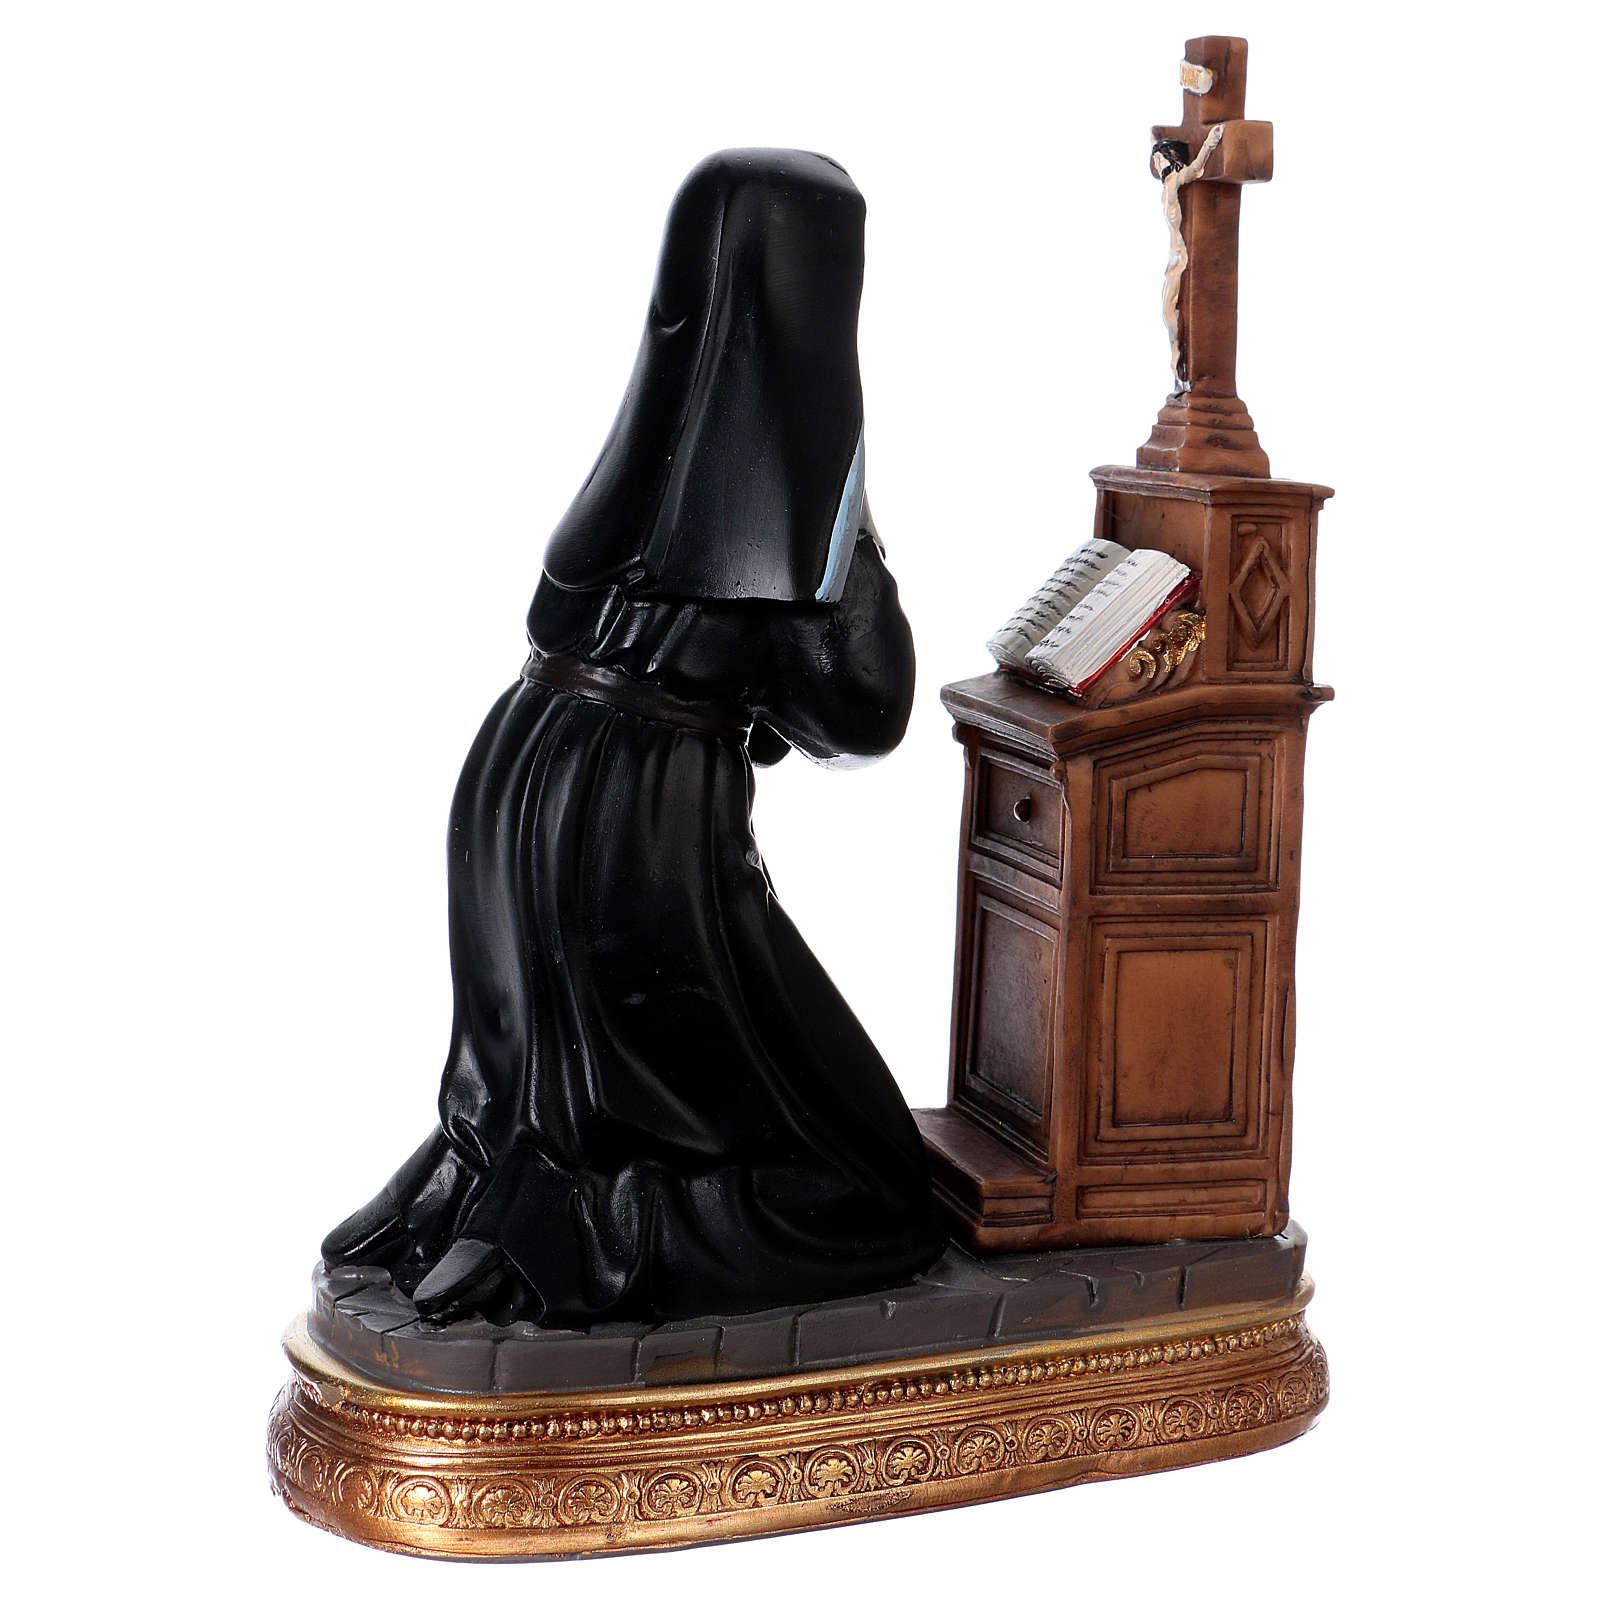 St. Rita kneeling statue in resin 17 cm 4